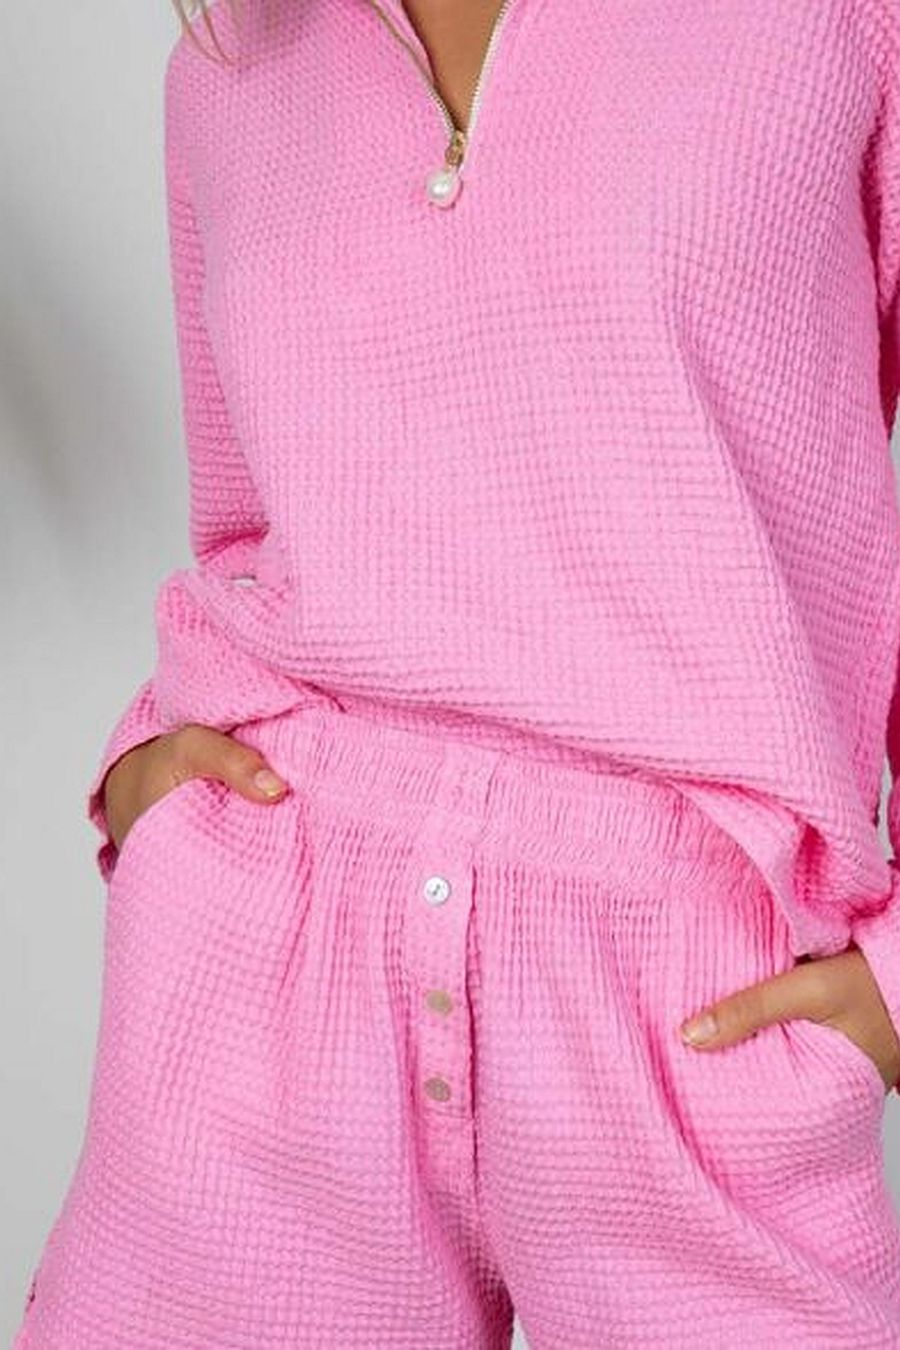 DONNI. Waffle 1/2 Zip Pullover - Flamingo